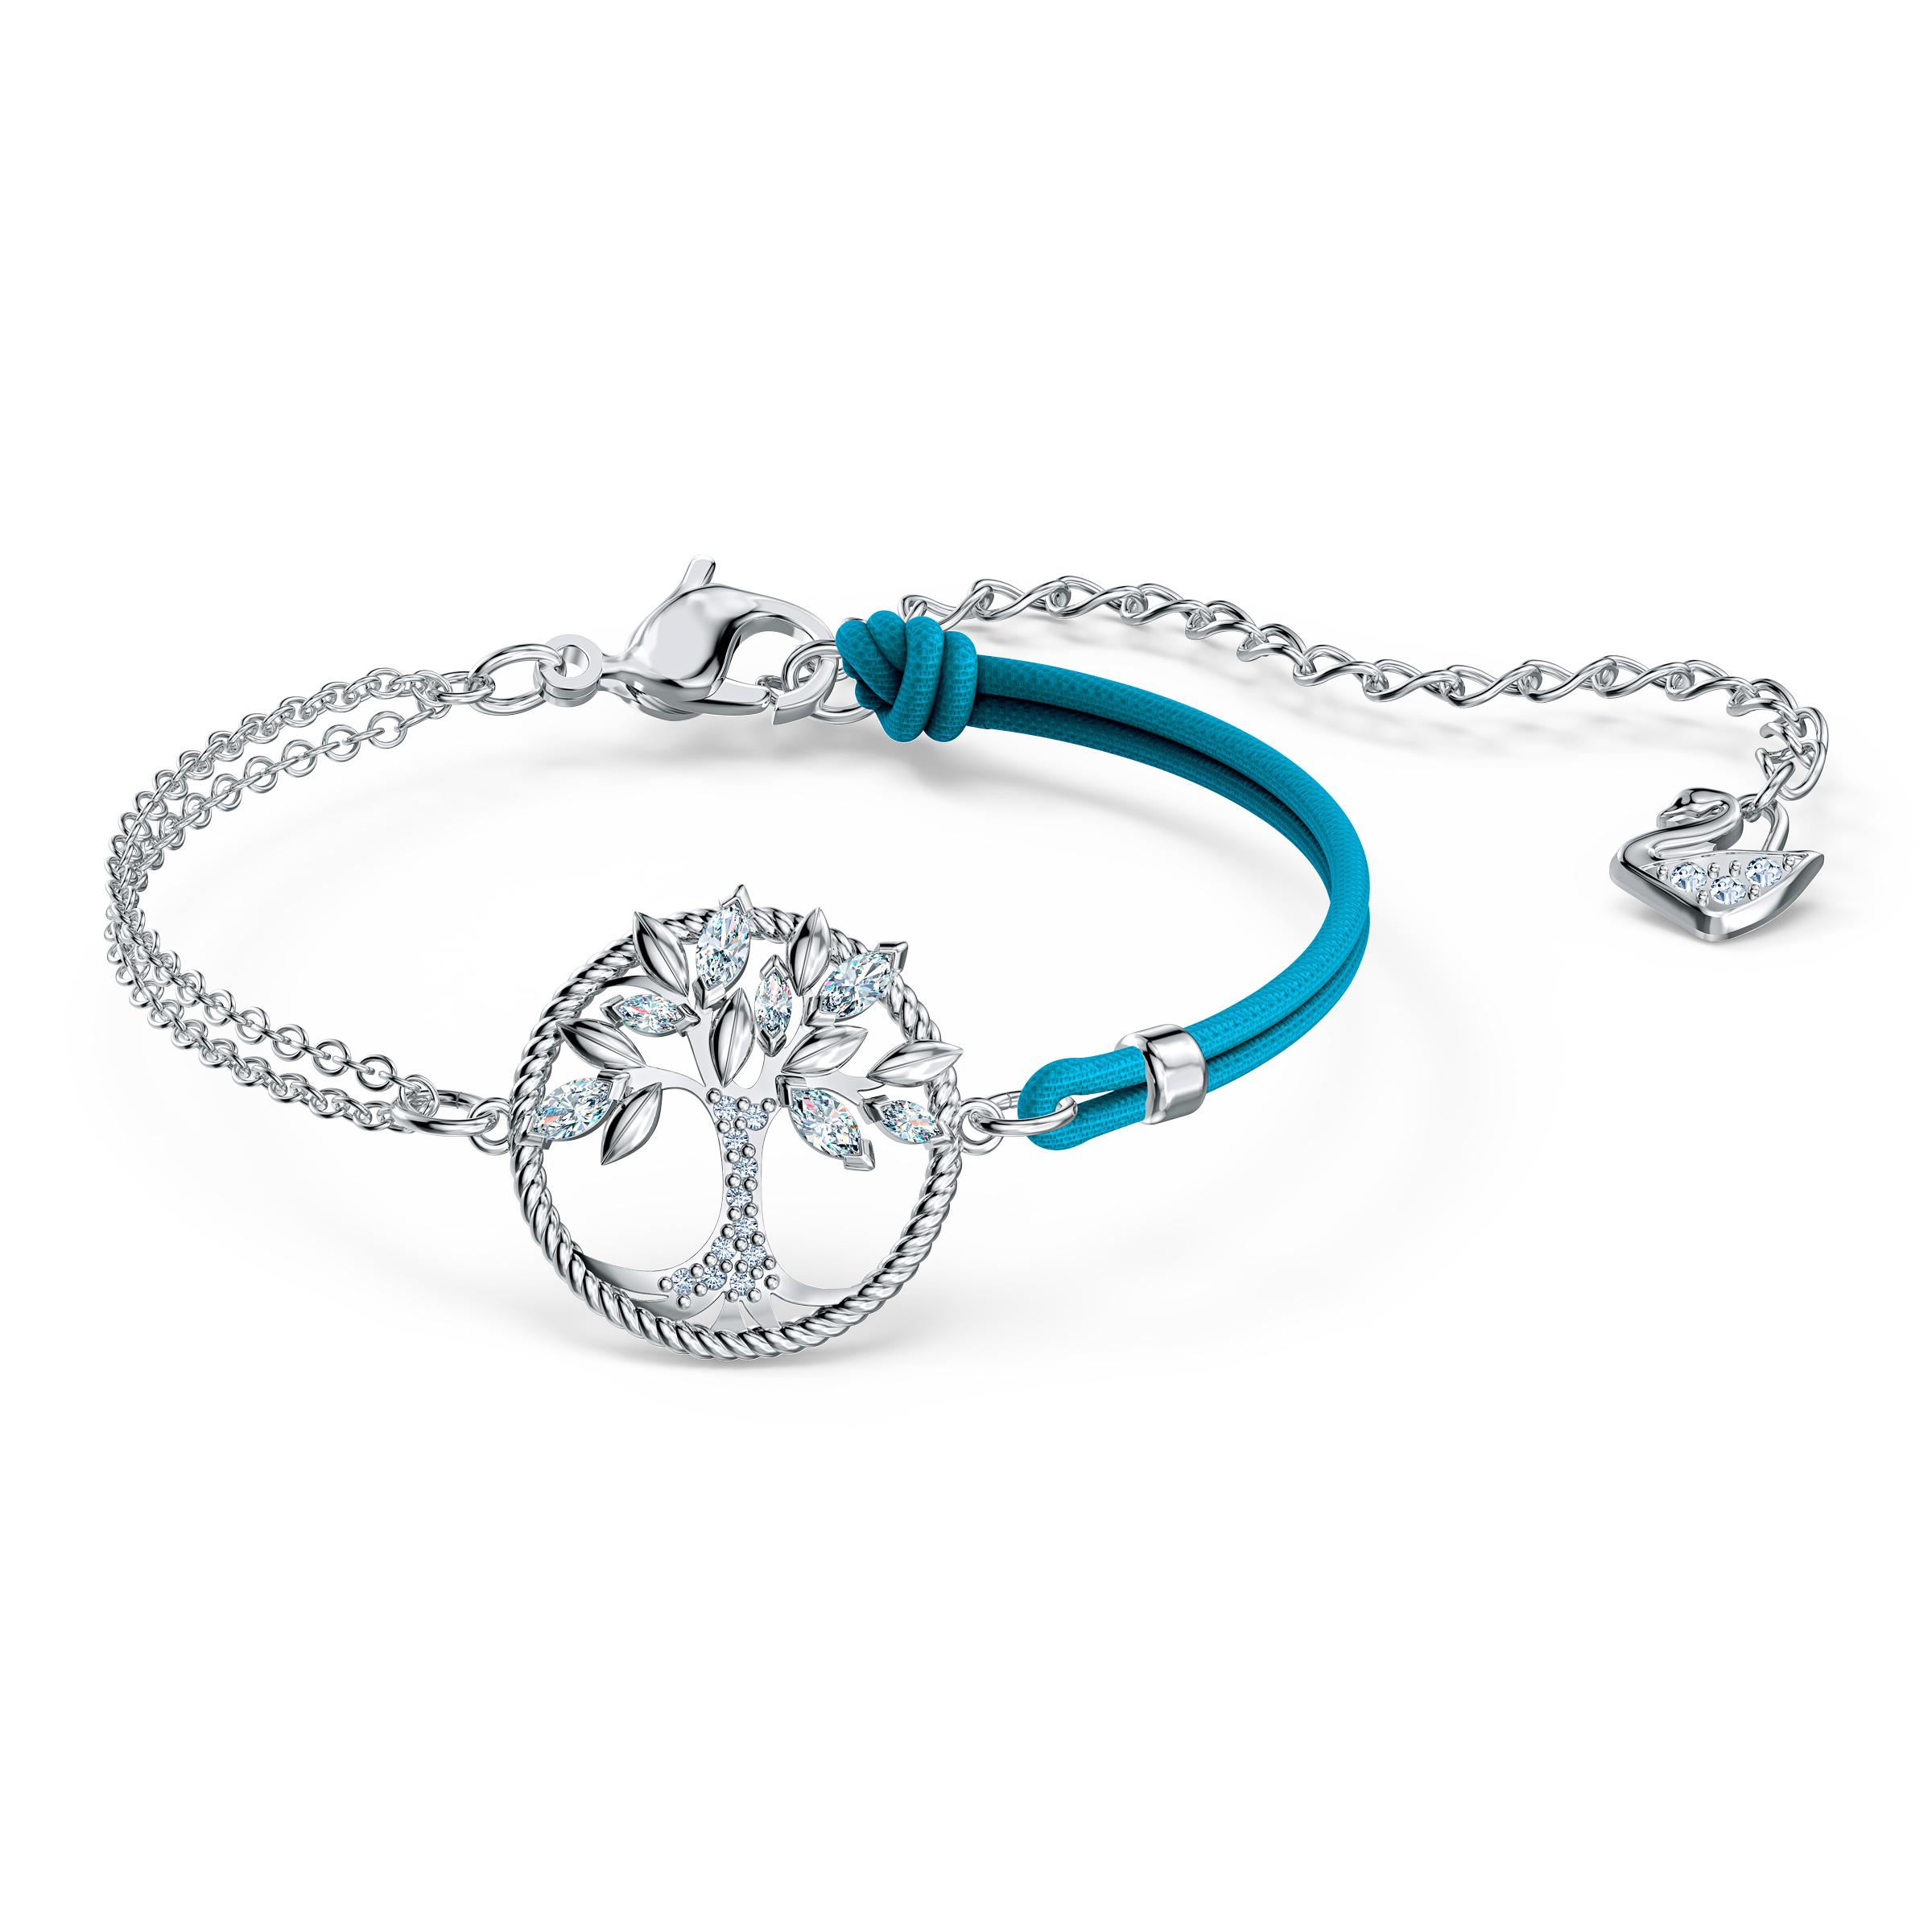 Bracelet Swarovski Symbolic Tree of Life, bleu, métal rhodié, Swarovski